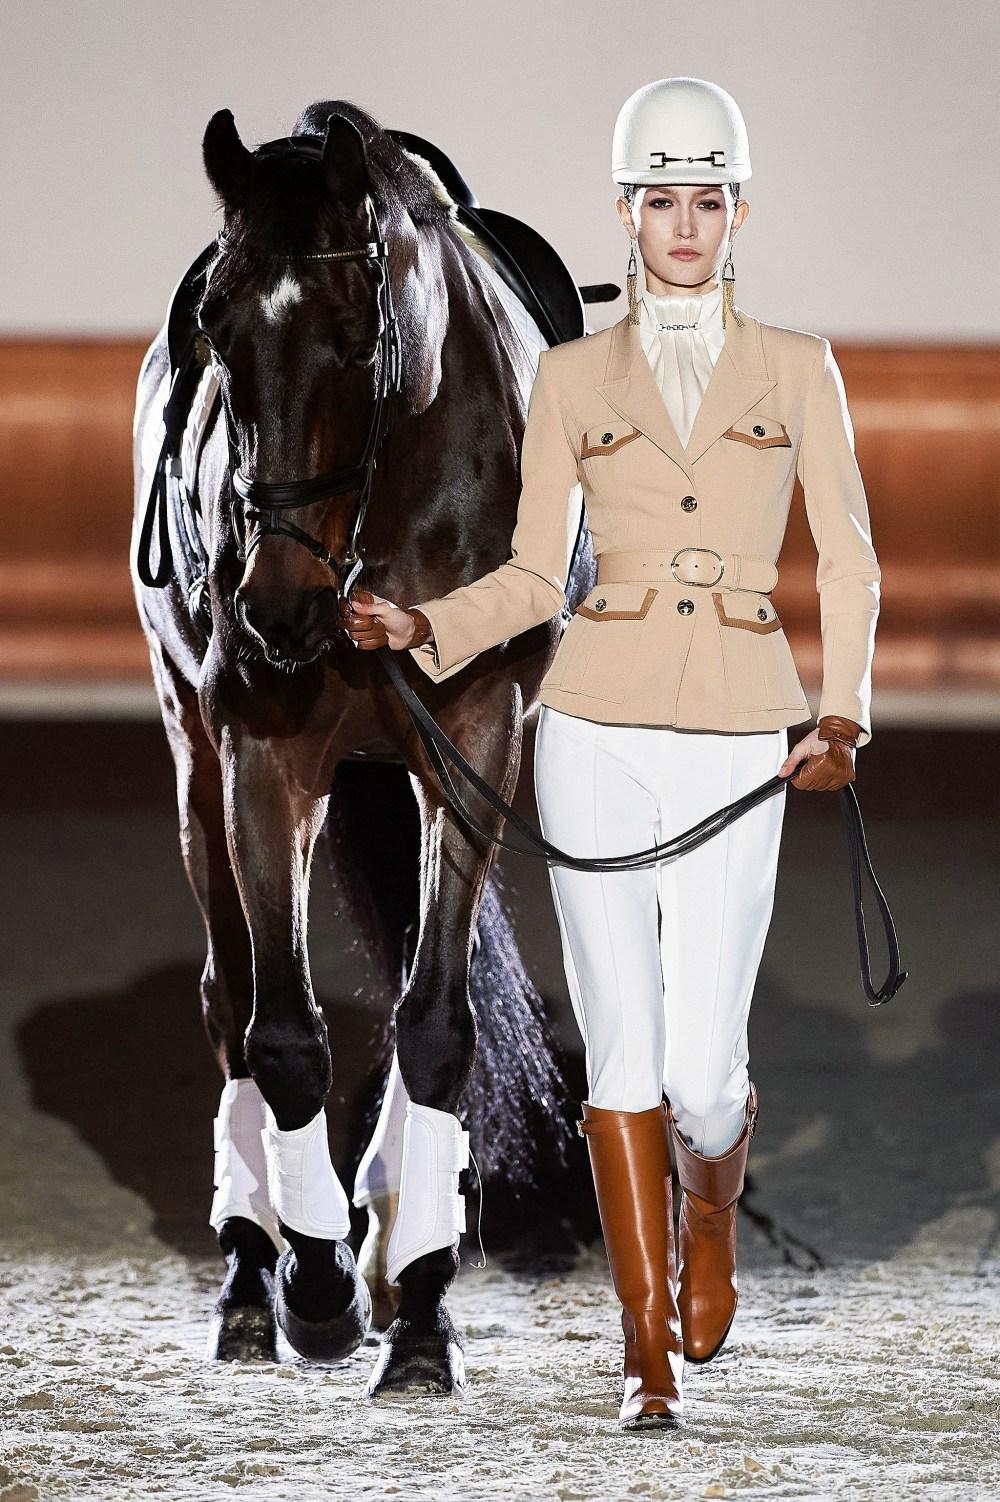 Elisabetta Franchi: Elisabetta Franchi Fall Winter 2021-22 Fashion Show Photo #1